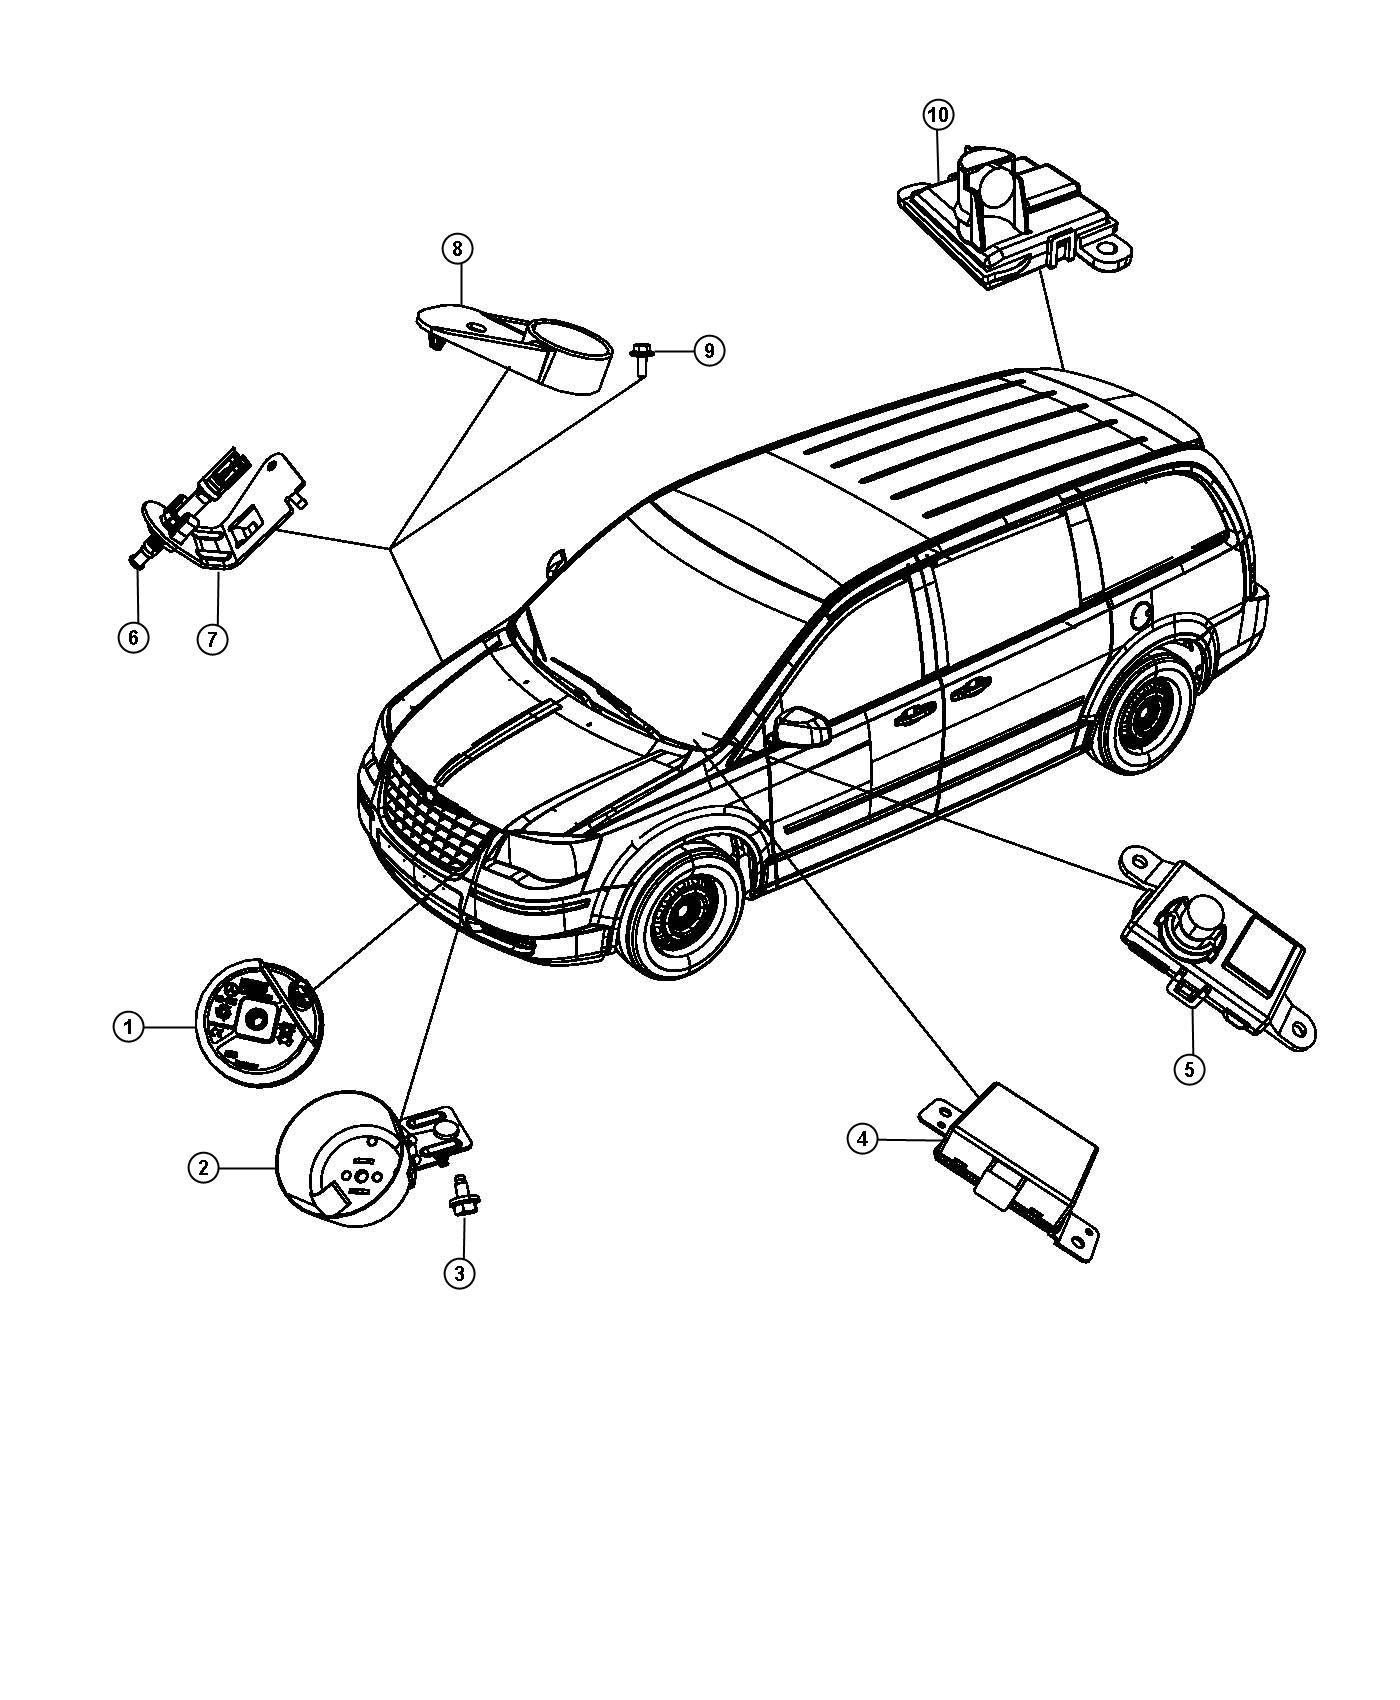 Dodge Grand Caravan Siren Alarm System